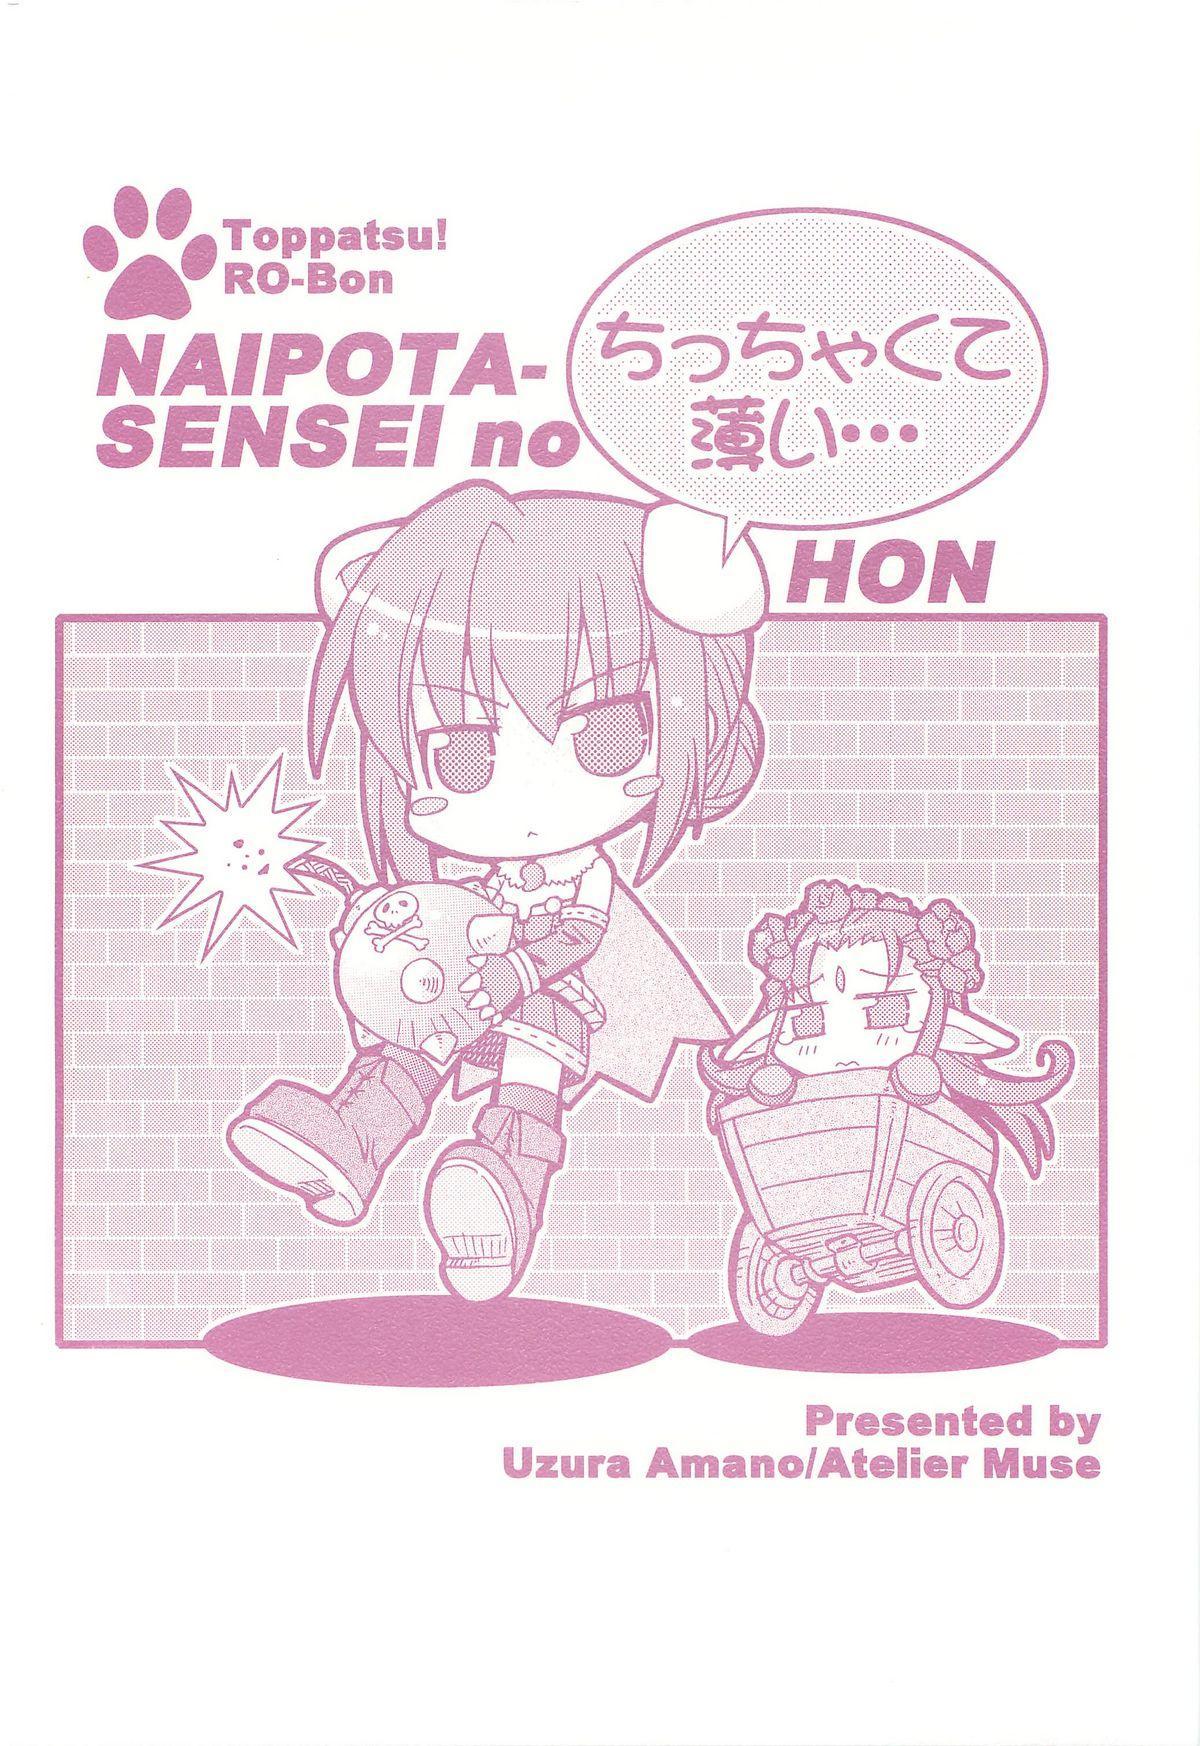 [Atelier Muse] toppatsu RO-bon naipota-sensei no chitcha kuteusui hon 17